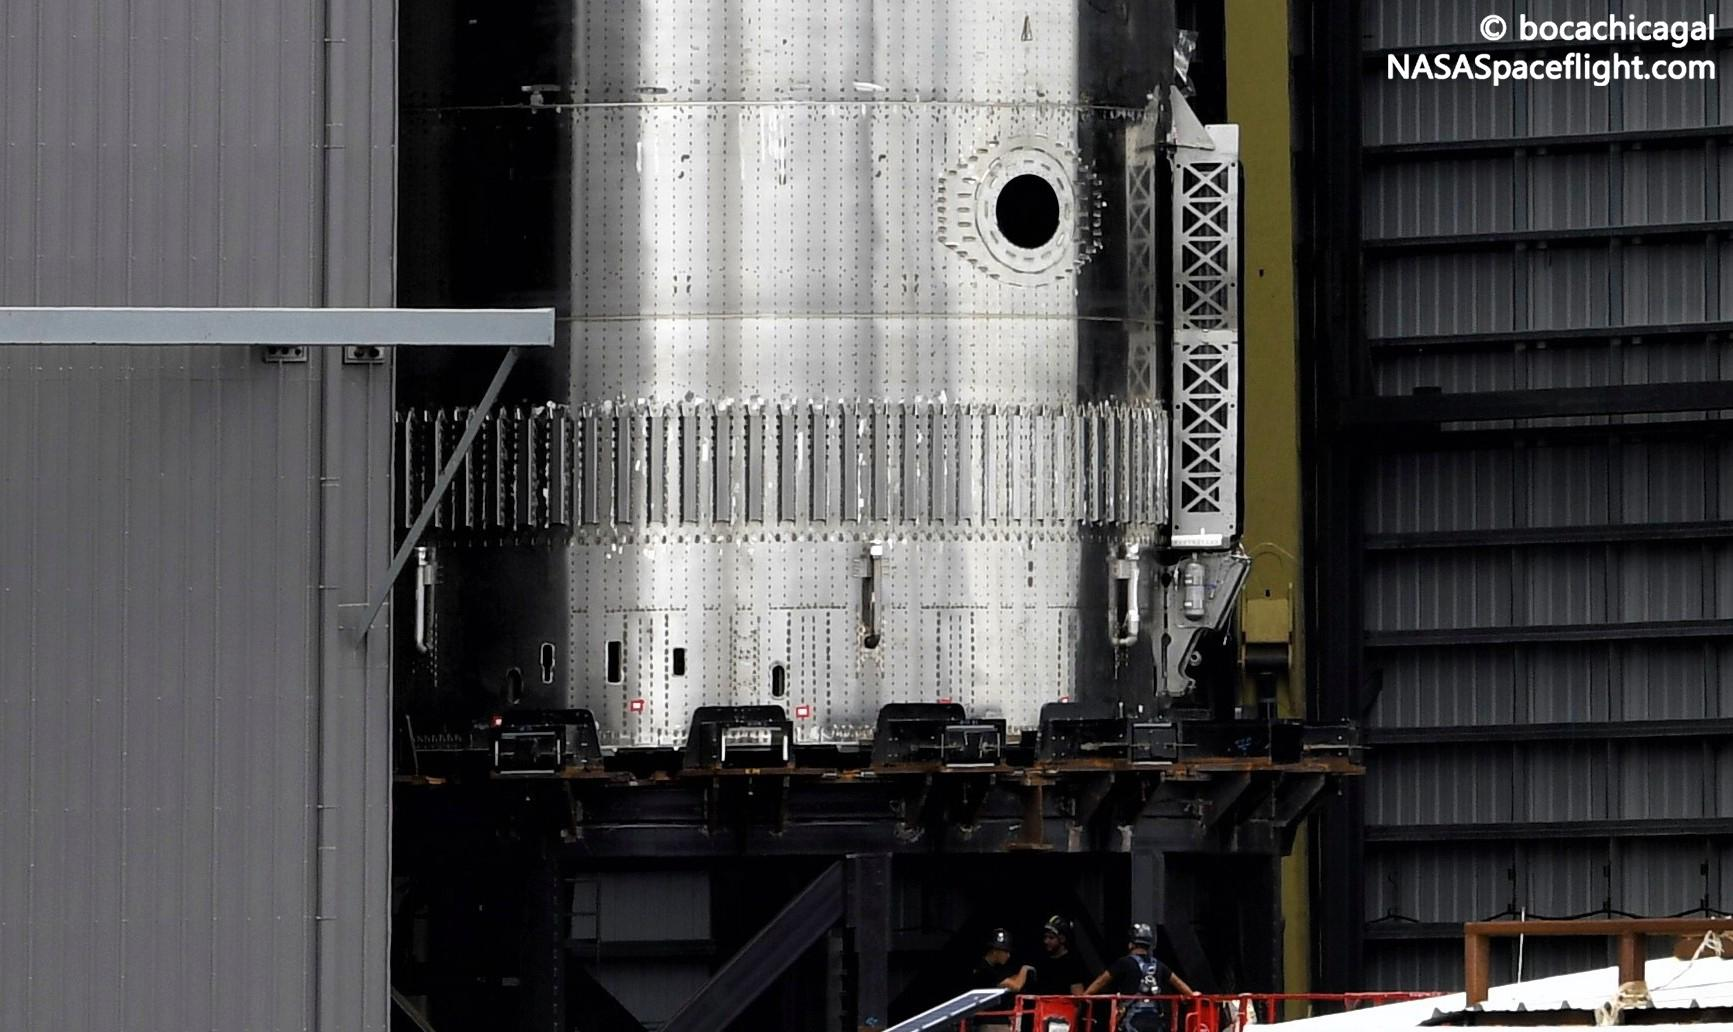 Starship Boca Chica 062921 (NASASpaceflight – bocachicagal) B3 final stack 4 crop 1 (c)